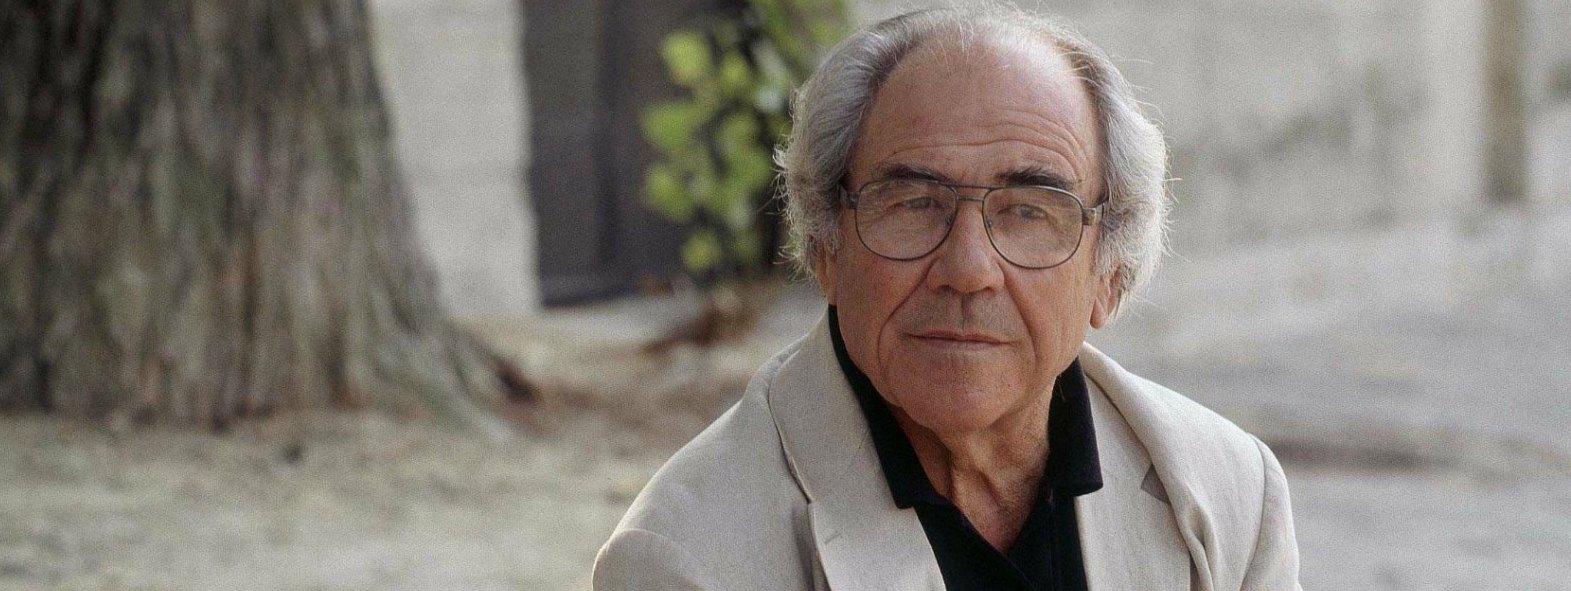 Tariq Goddard on Jean Baudrillard and the 1980s